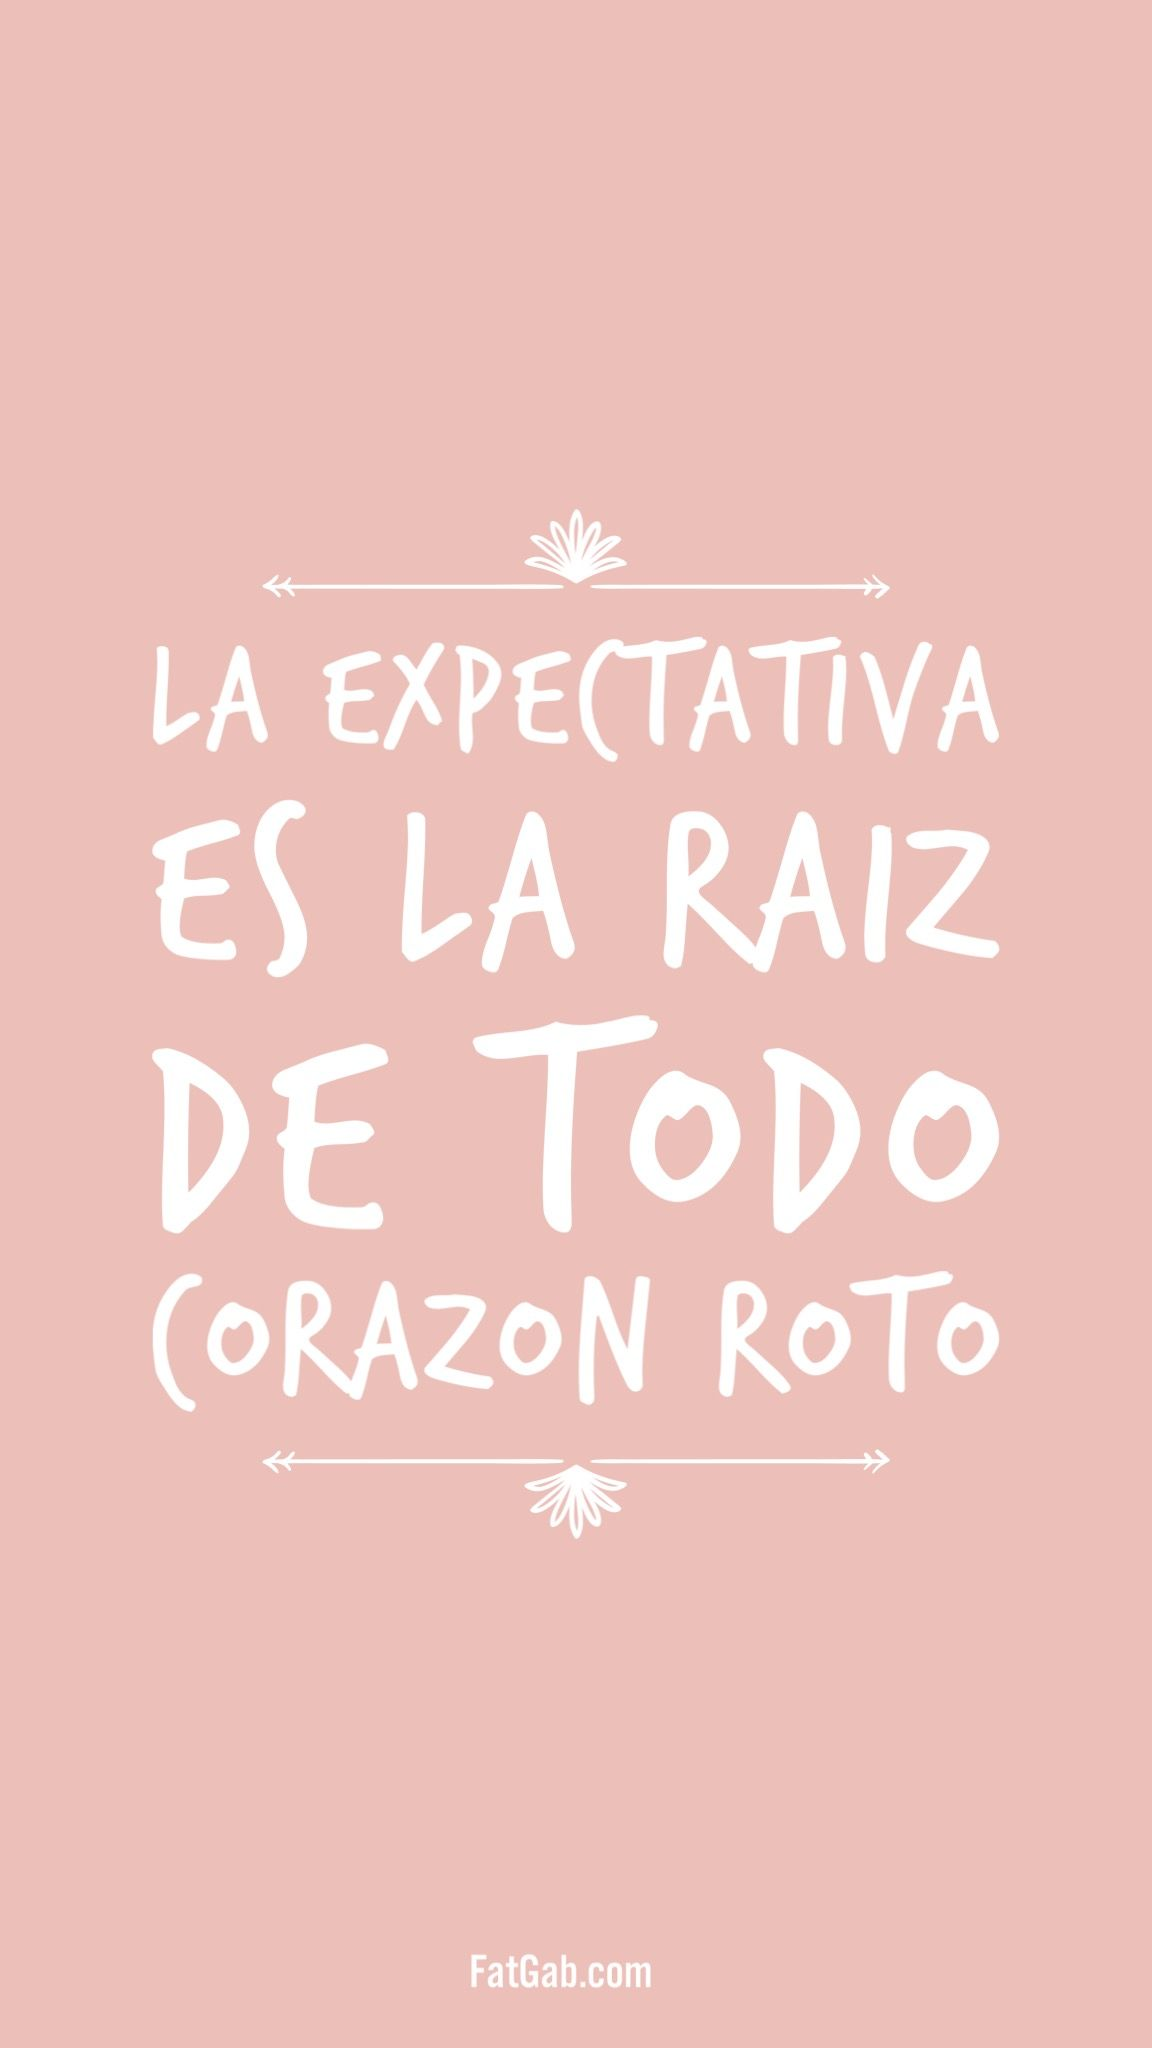 La Expectativa Es Corazon Roto Frases Amor Decepcion Tristeza Quotes